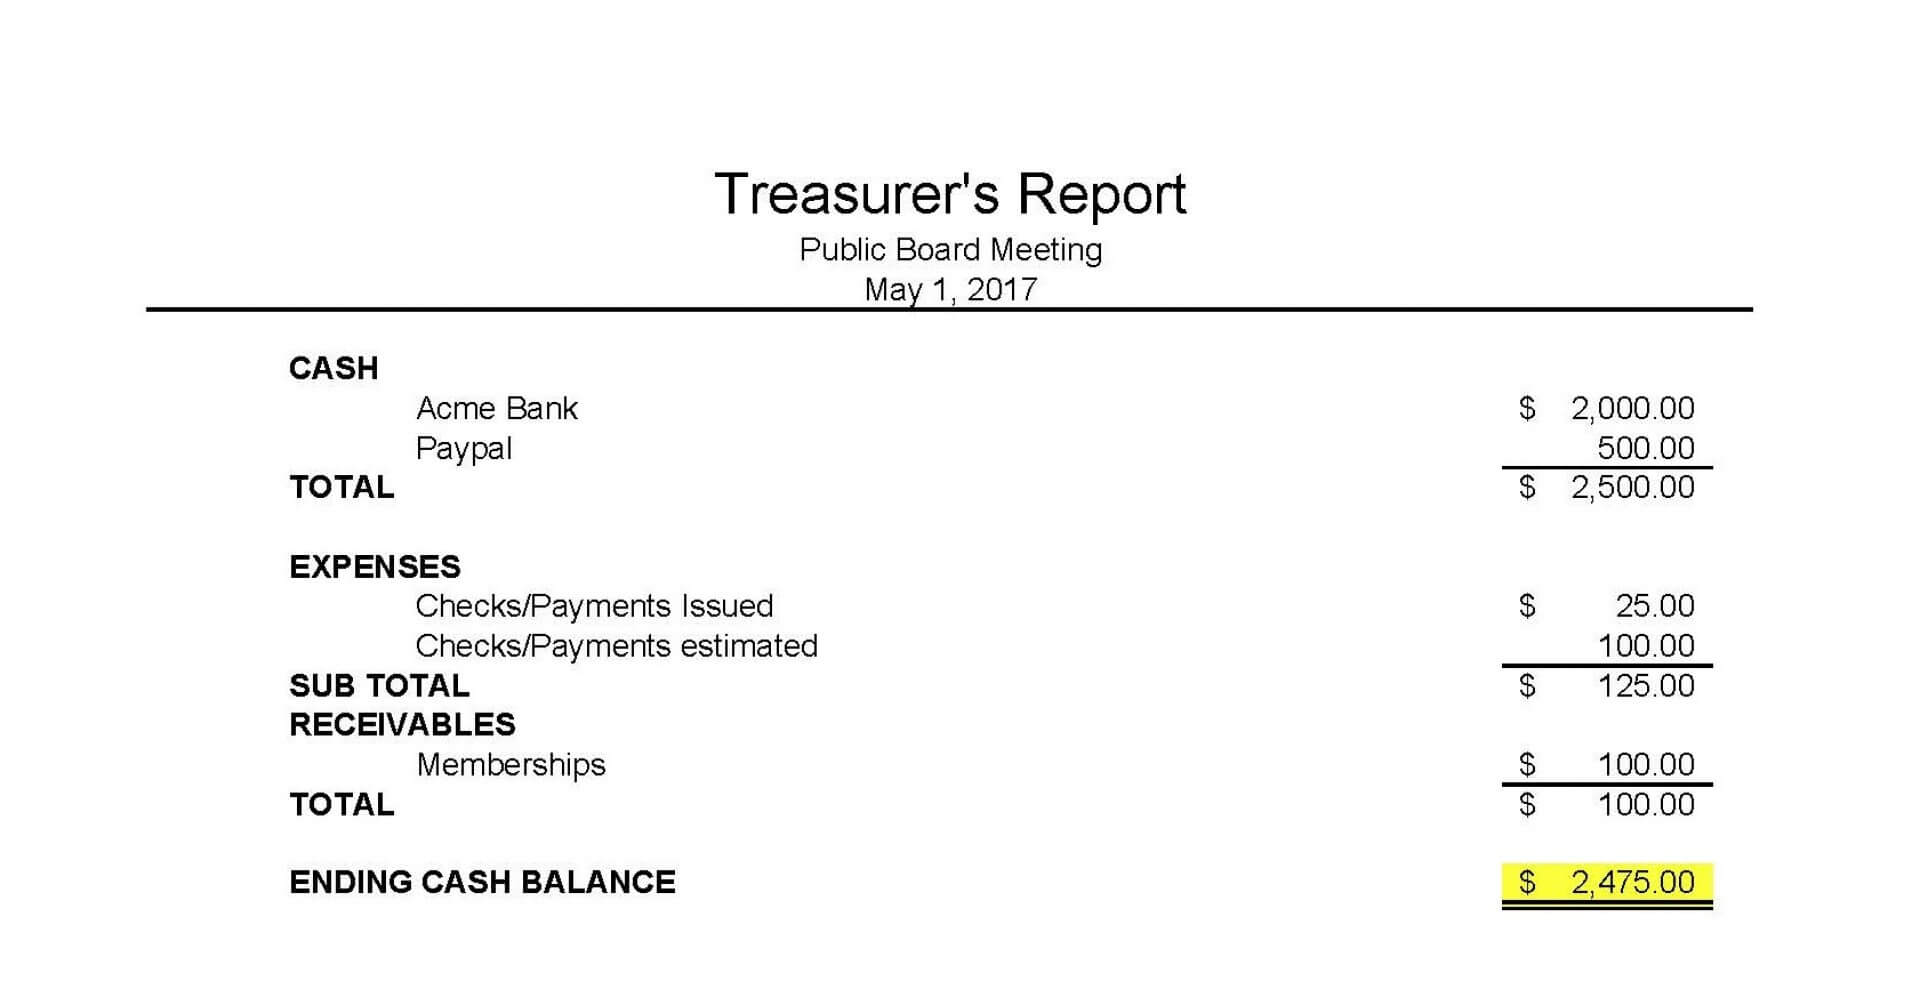 016 Treasurer Report Template Non Profit Ideas Treasurers With Treasurer Report Template